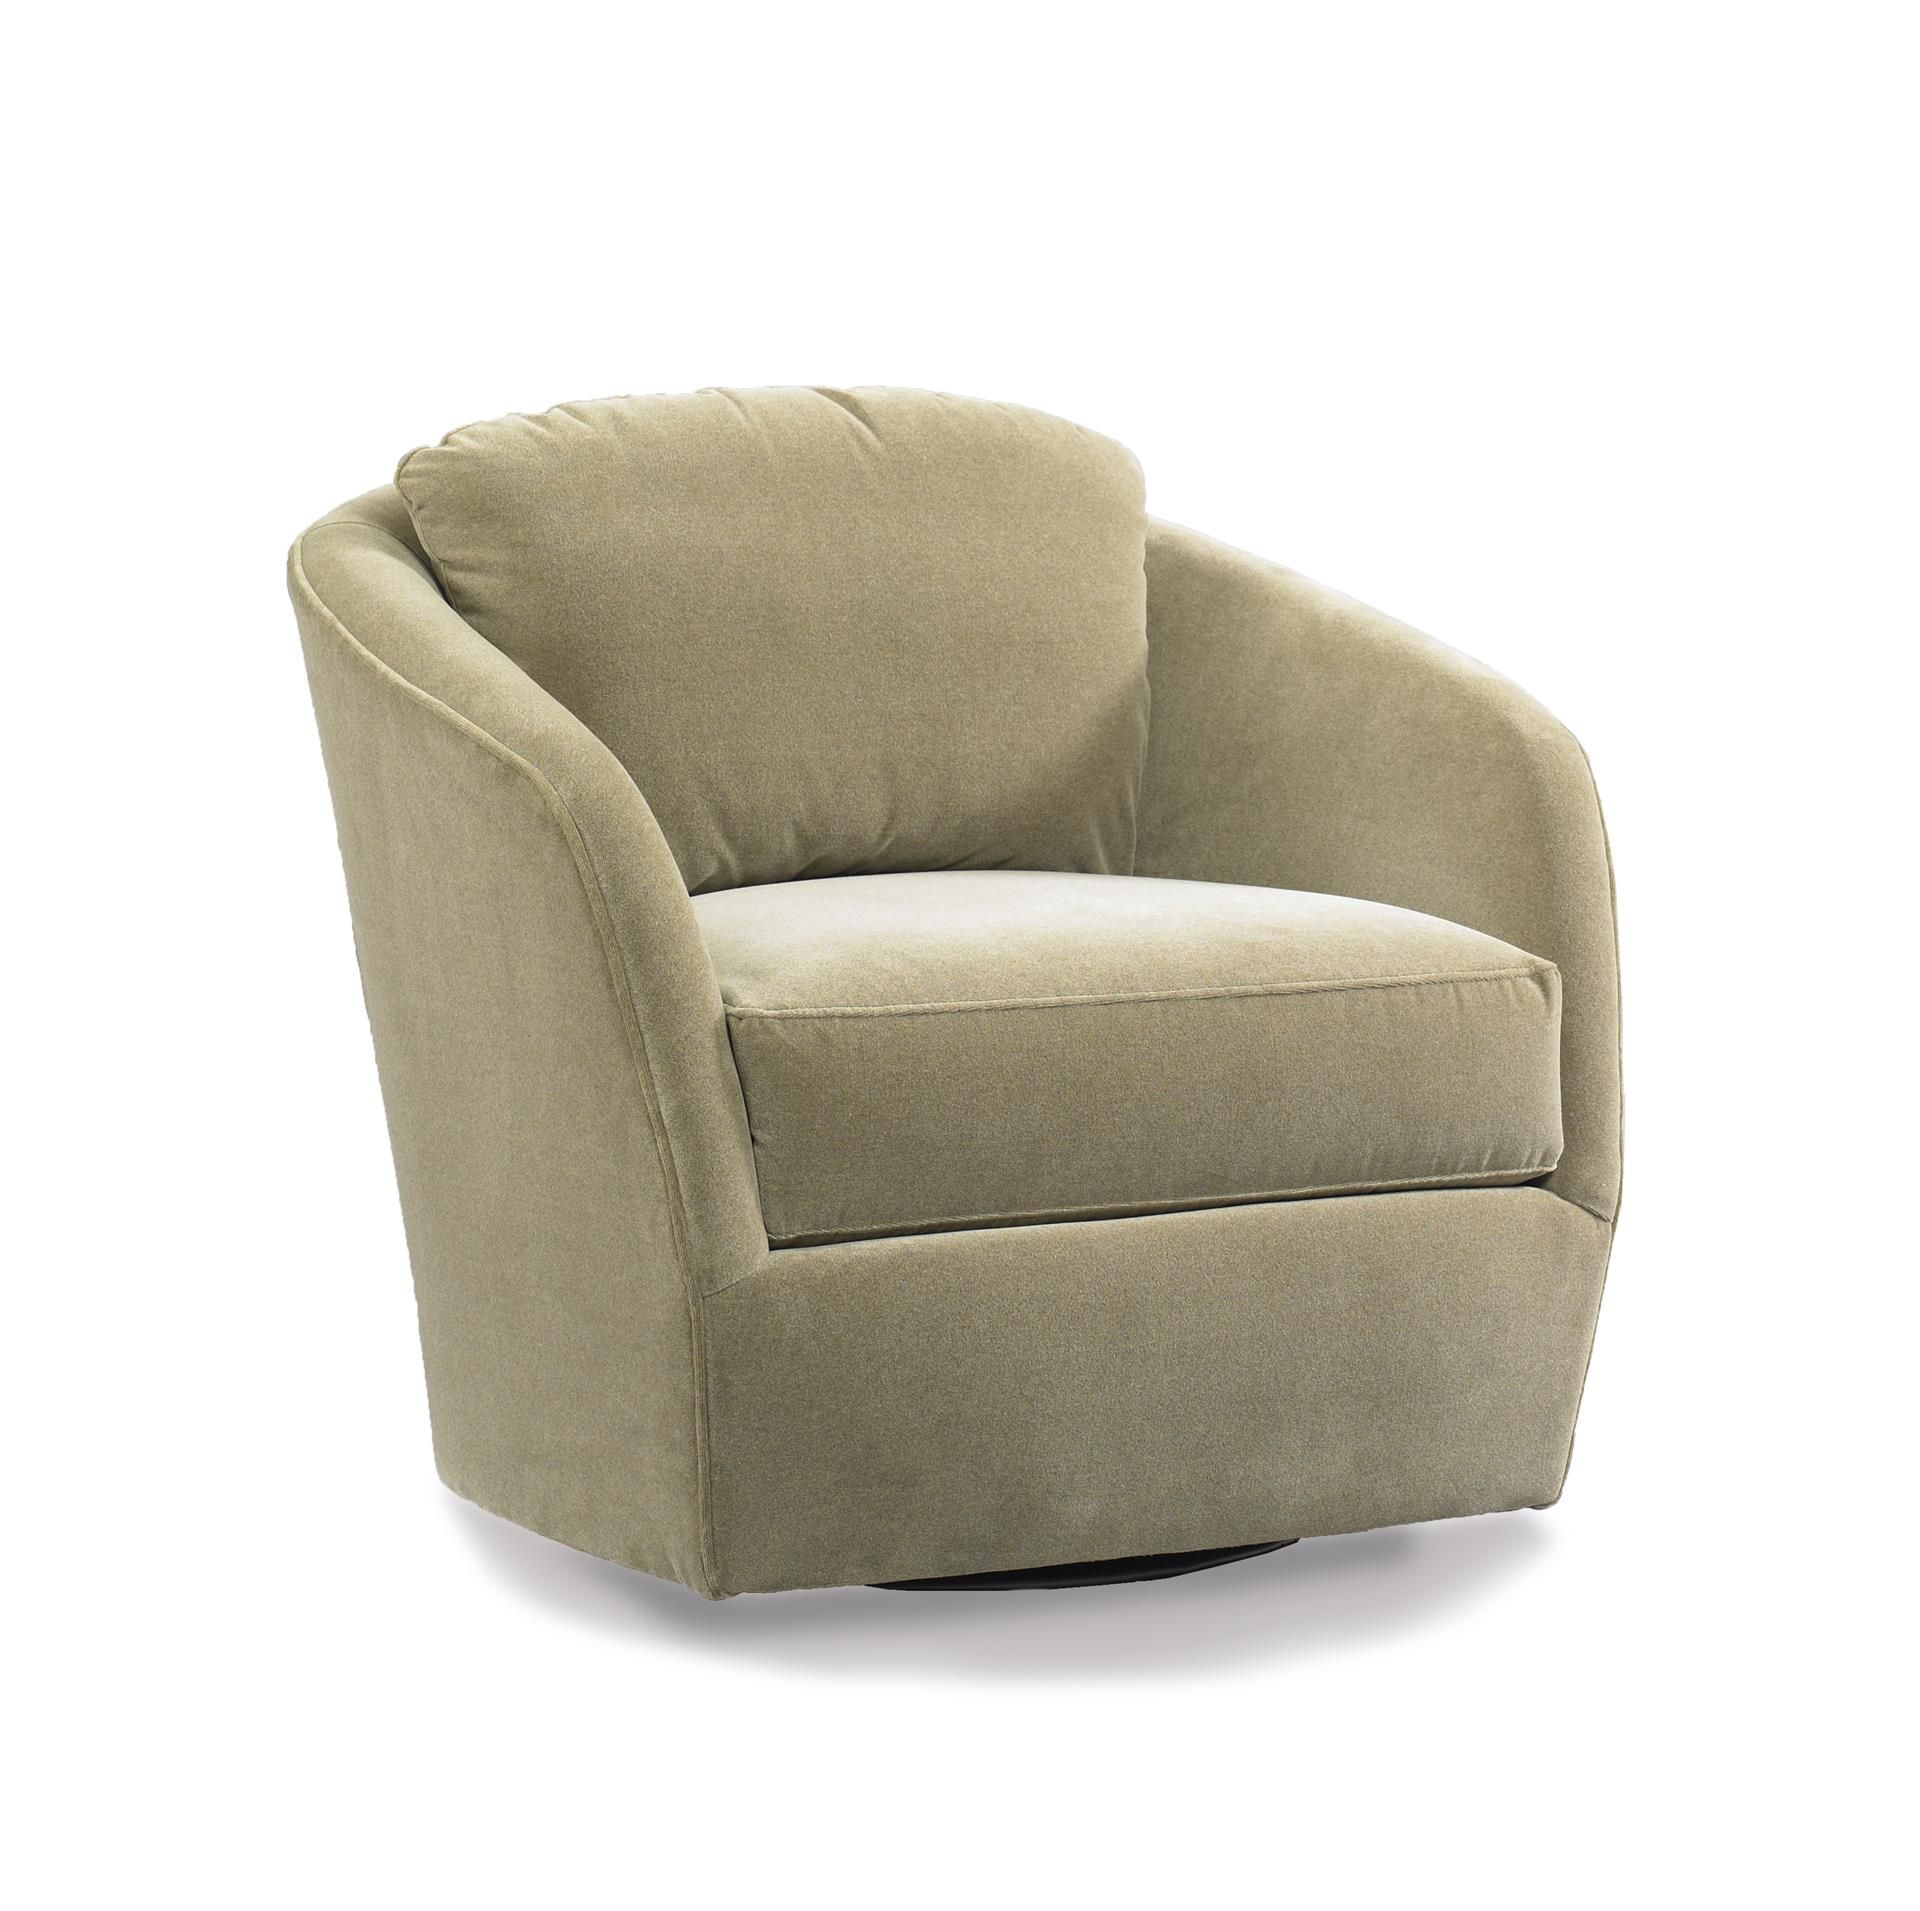 American Made Gordon Swivel Accent Chair Stylish Chairs Swivel